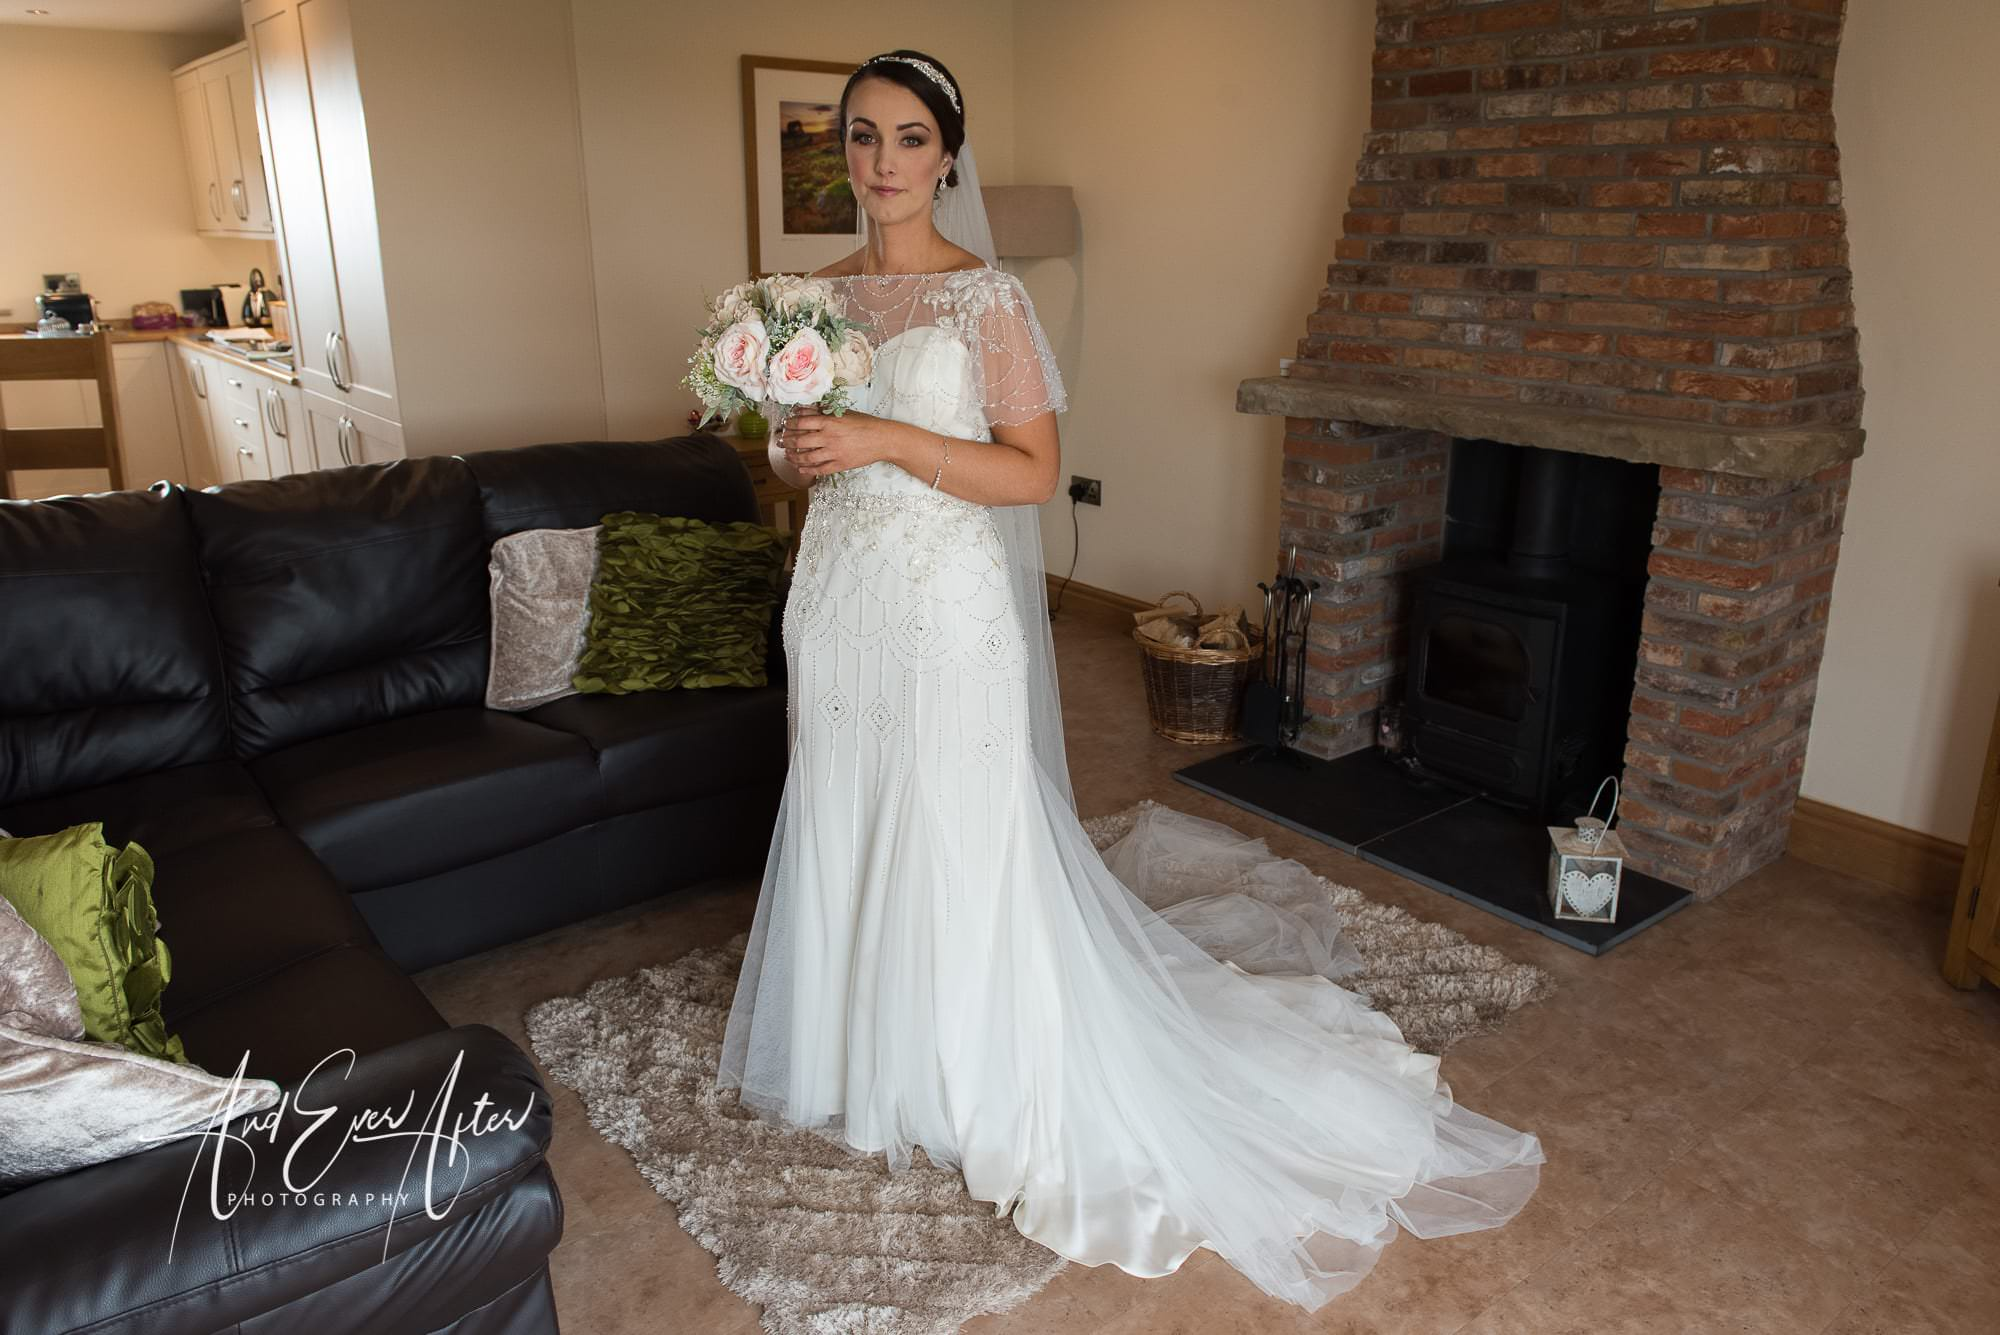 bride, wedding dress, bridal bouquet